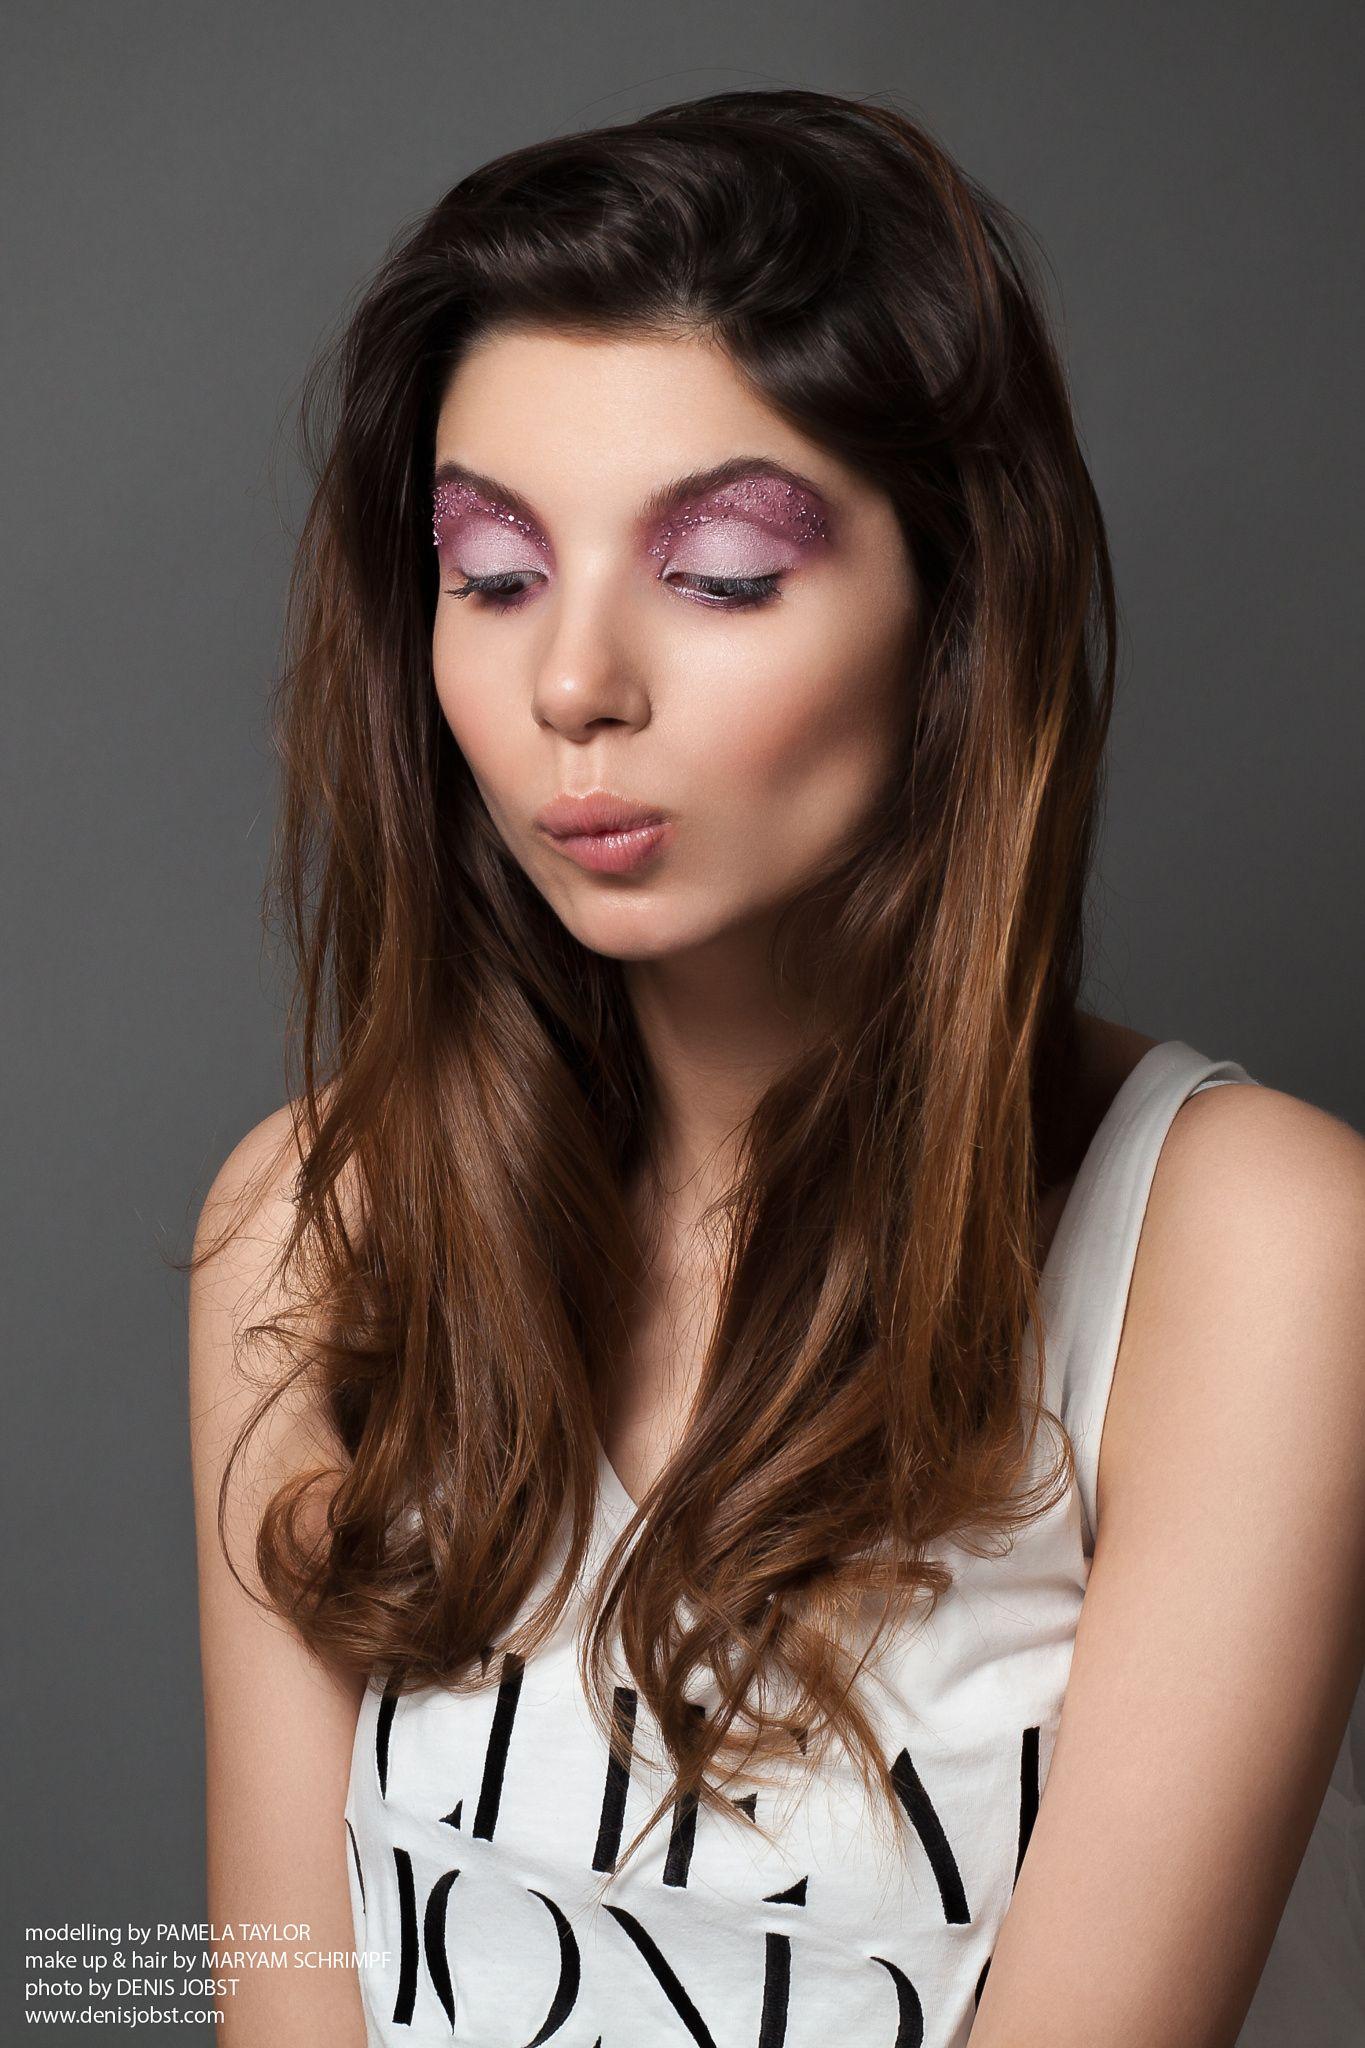 70ed4079a1 Model: Pamela Taylor MUA/Hair: Maryam Schrimpf Photo: Denis Jobst  Photography &